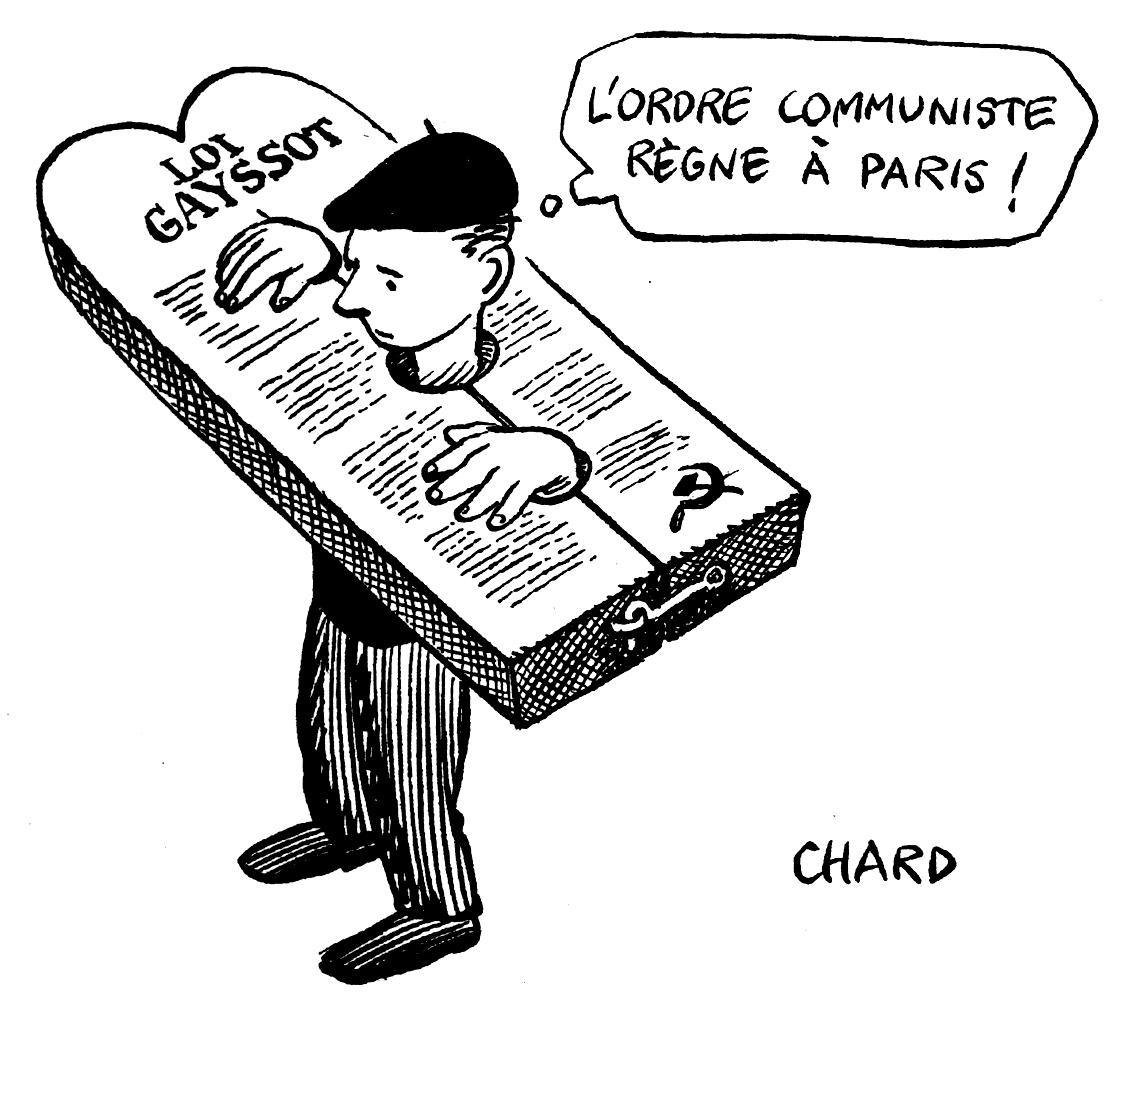 036  chard revisionnisme loi gayssot ordre communiste paris